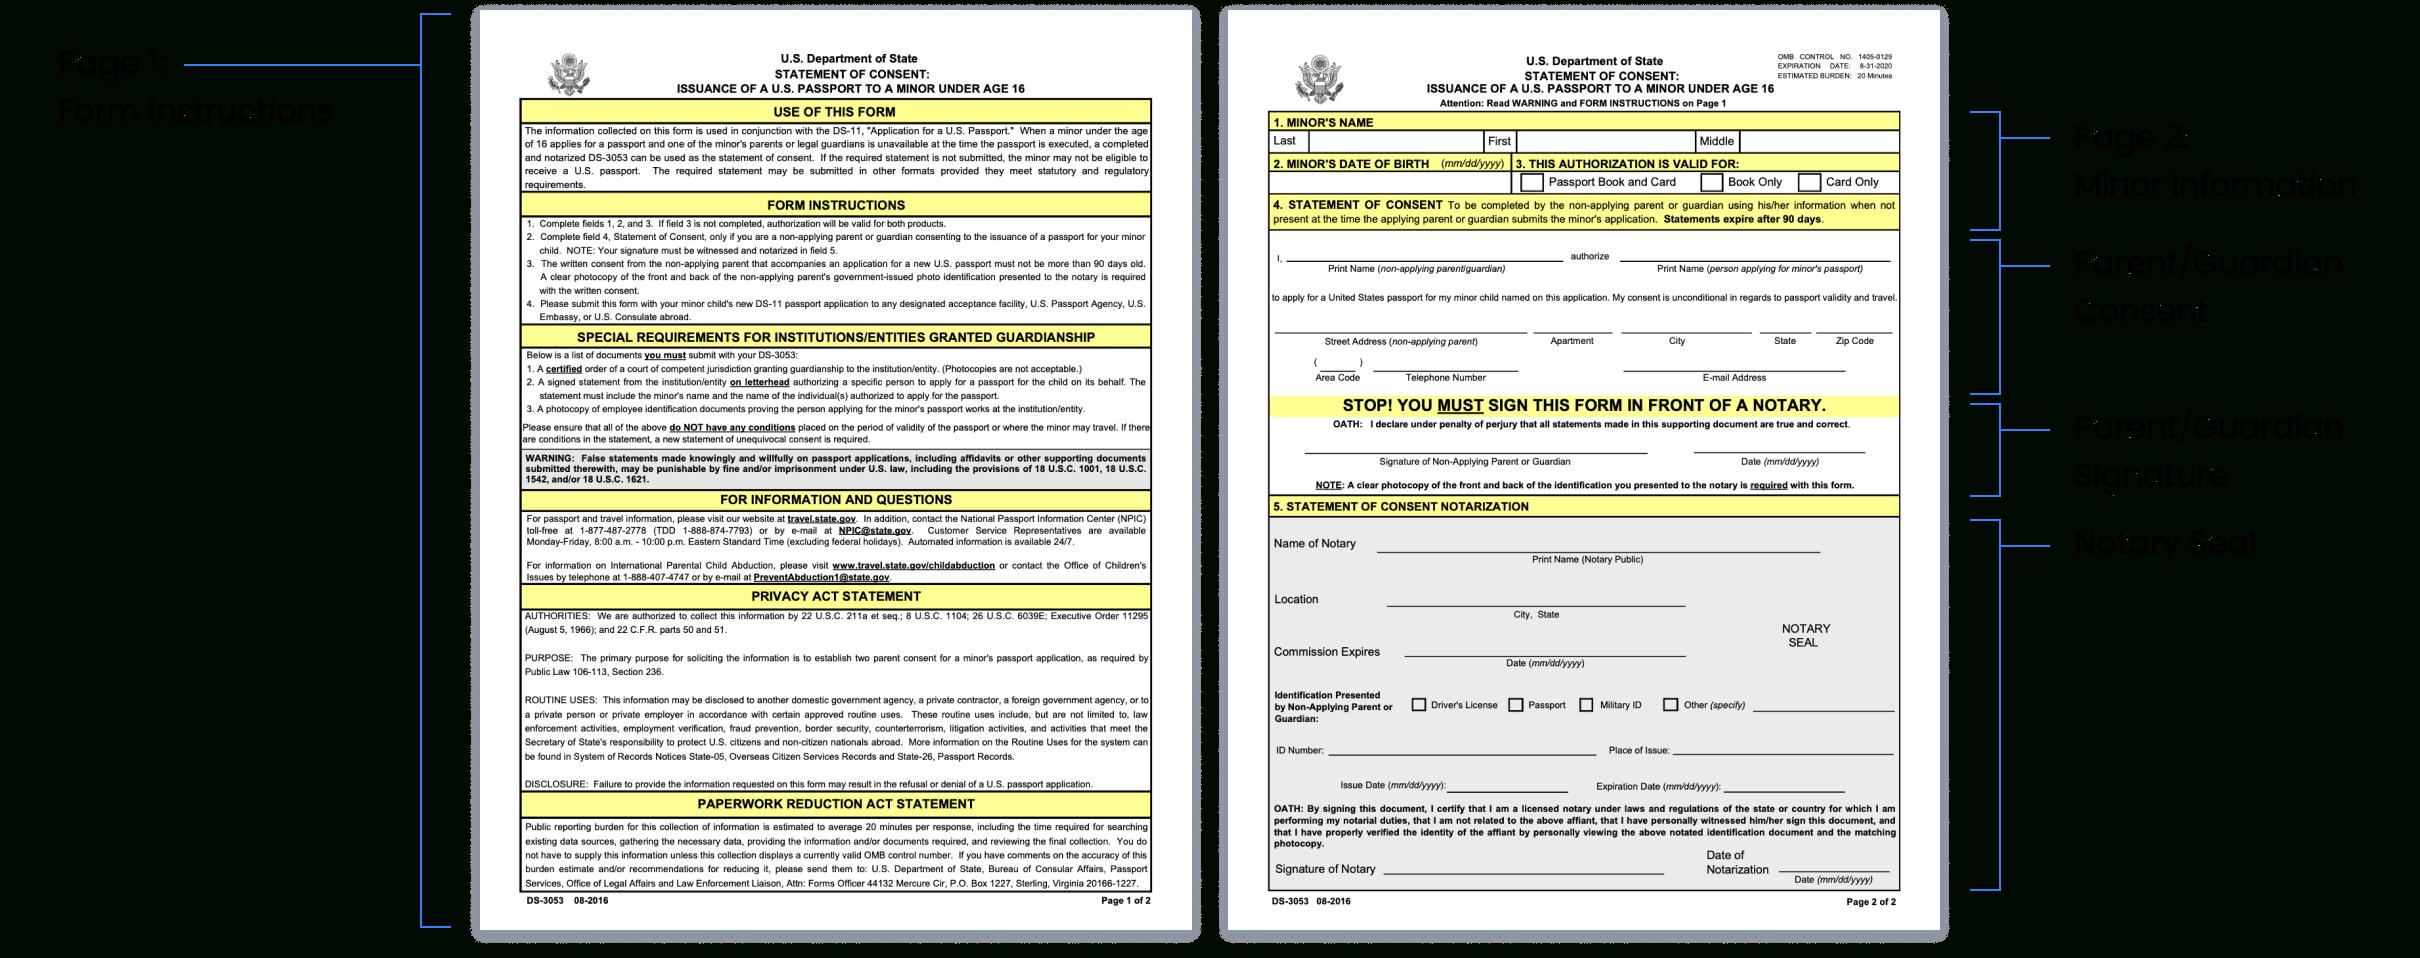 Notarize DS 3053 Form Passport Parental Consent Online